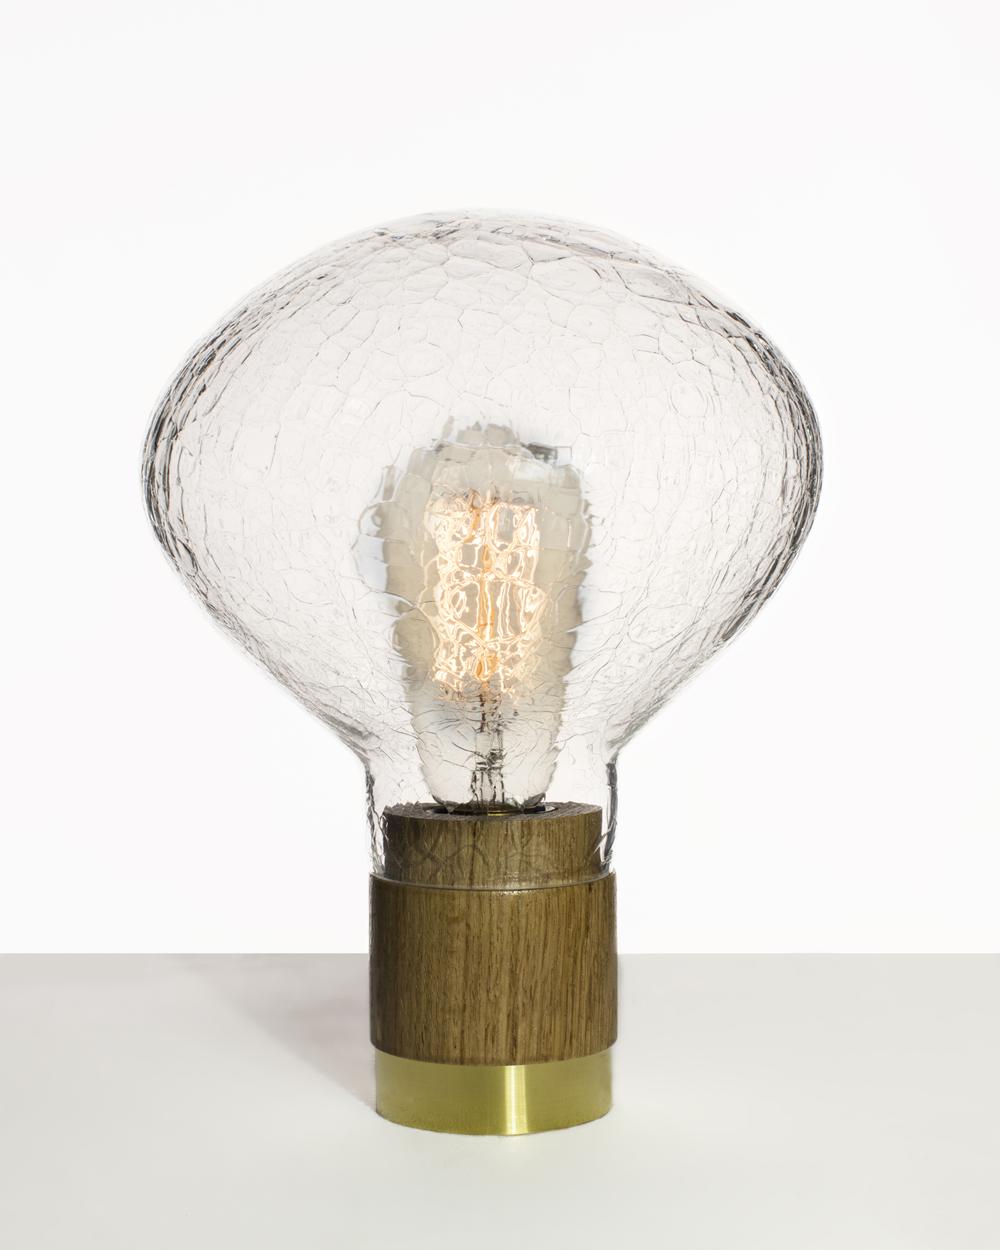 Lampe-CRAQUELE_web.jpg